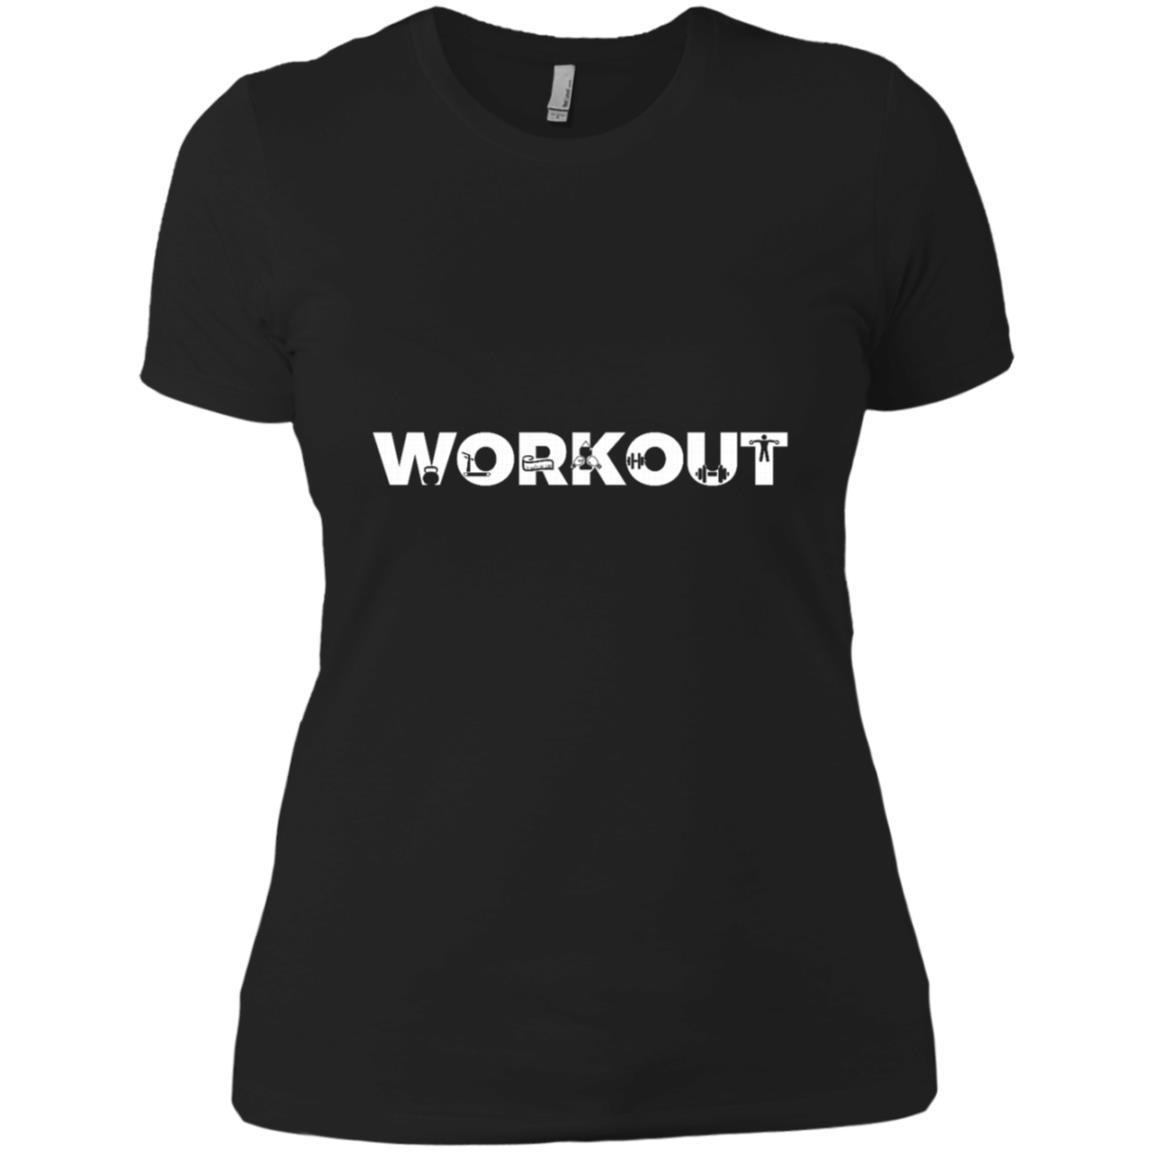 Workout Lifting Dumbbells Treadmill Training Women Short Sleeve